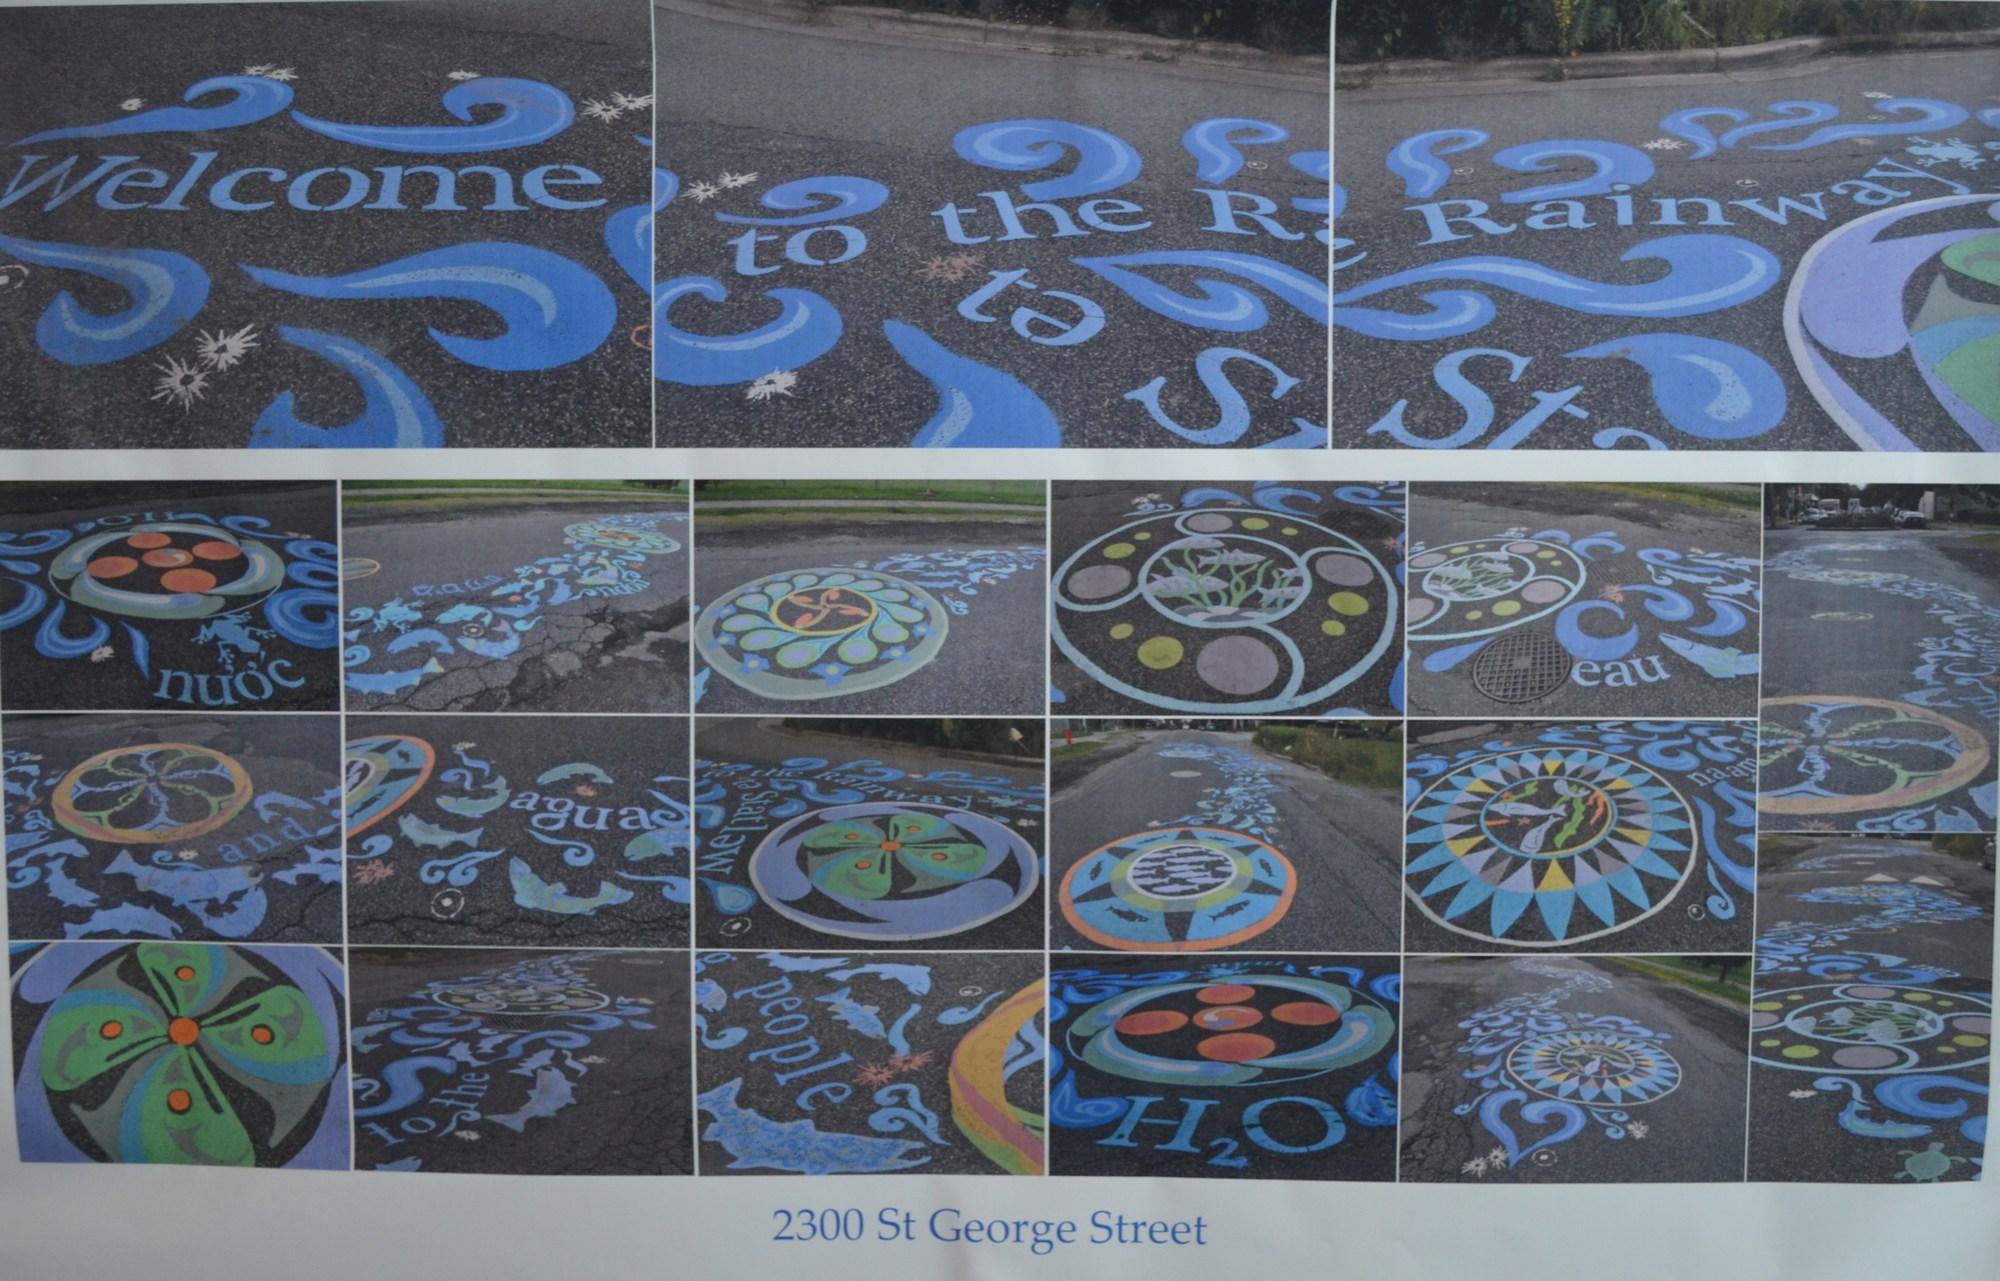 St. George Rainway_mosaic_2000p